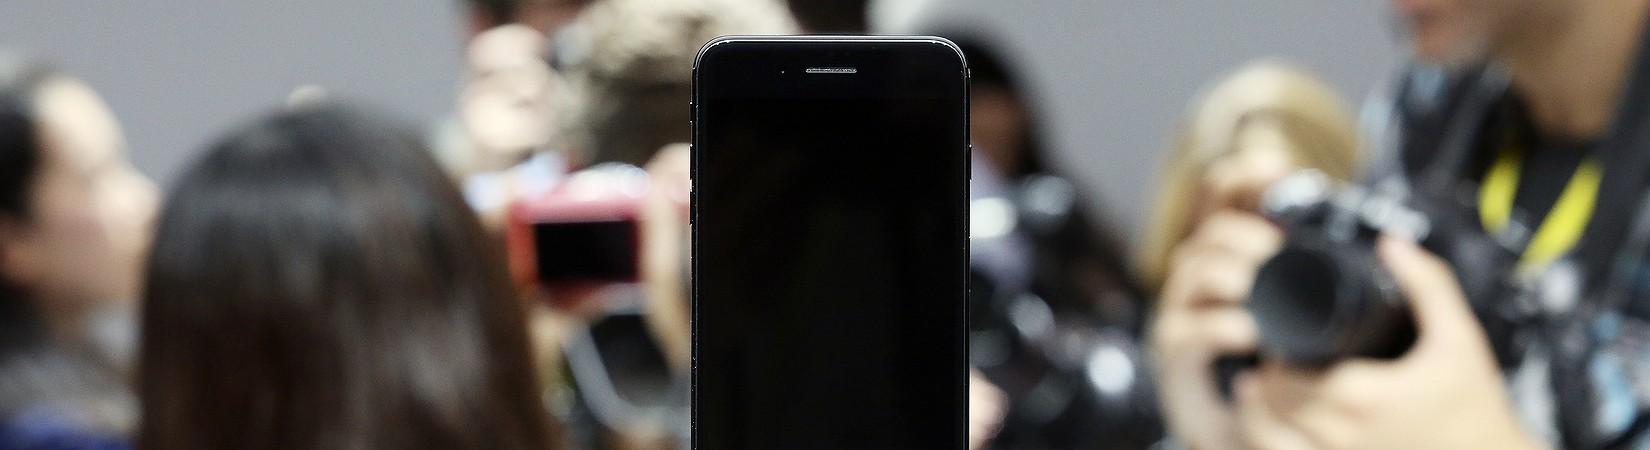 Apple apresenta novo iPhone